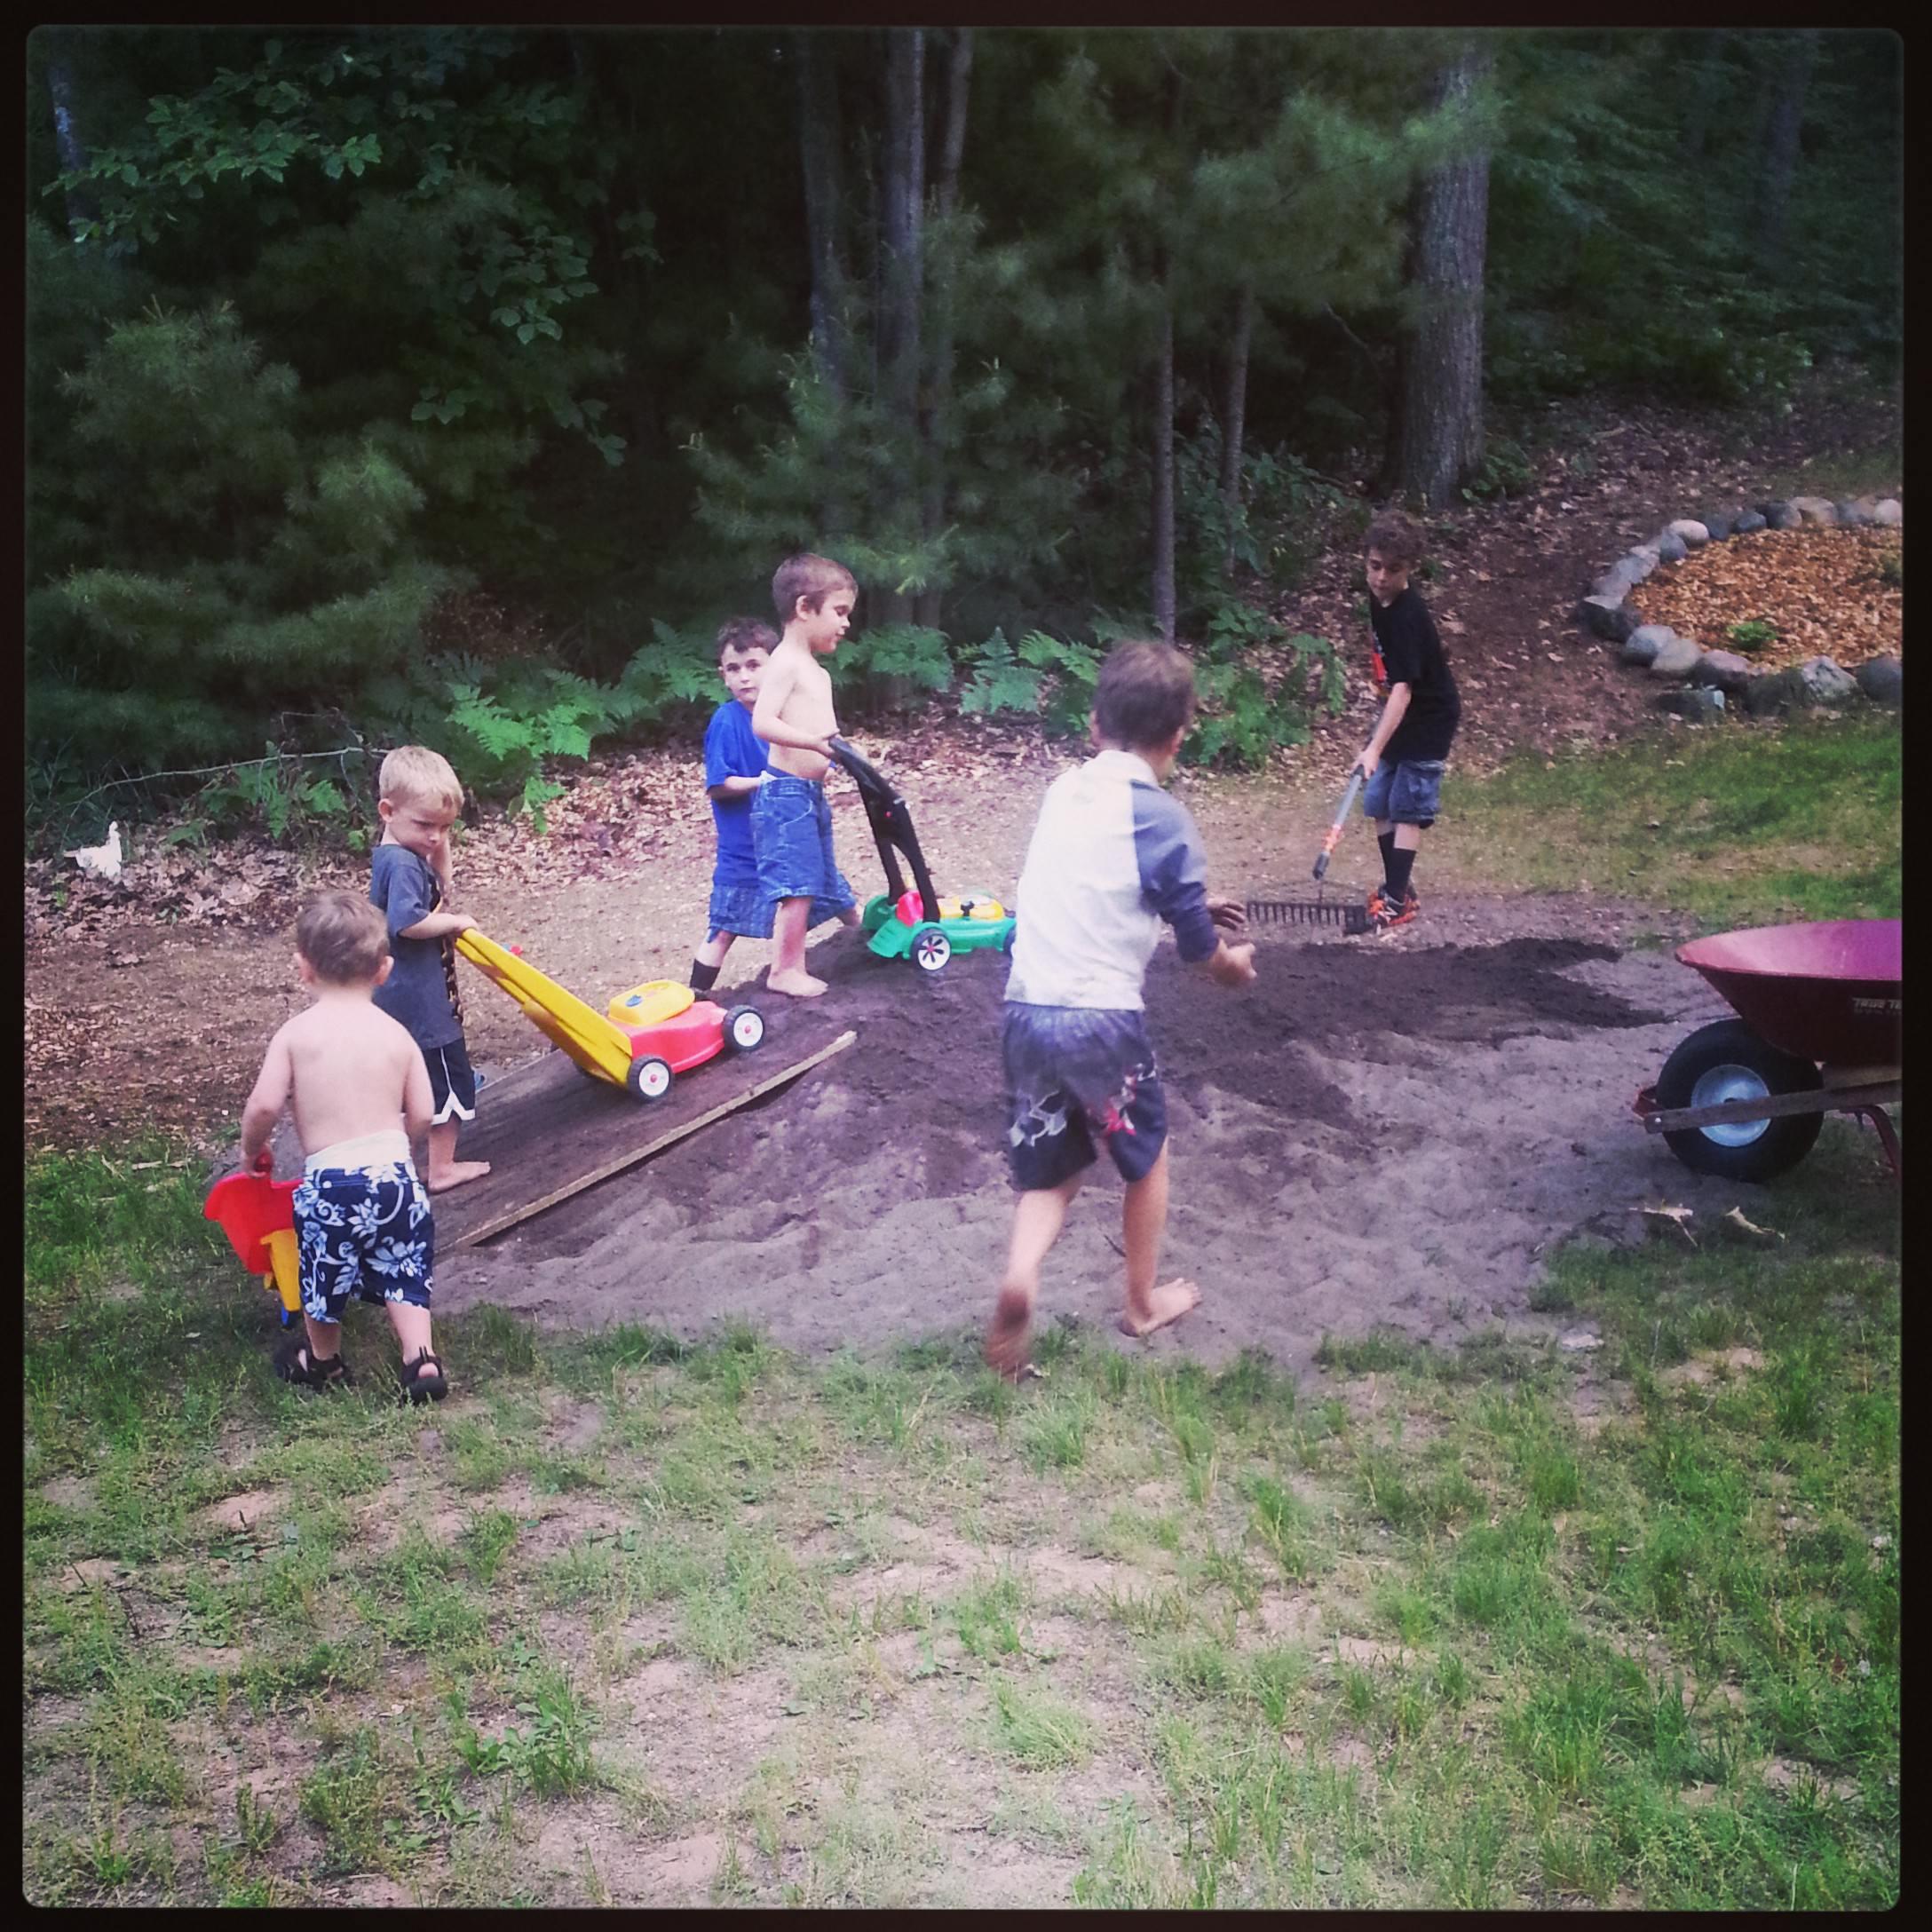 kids in dirt